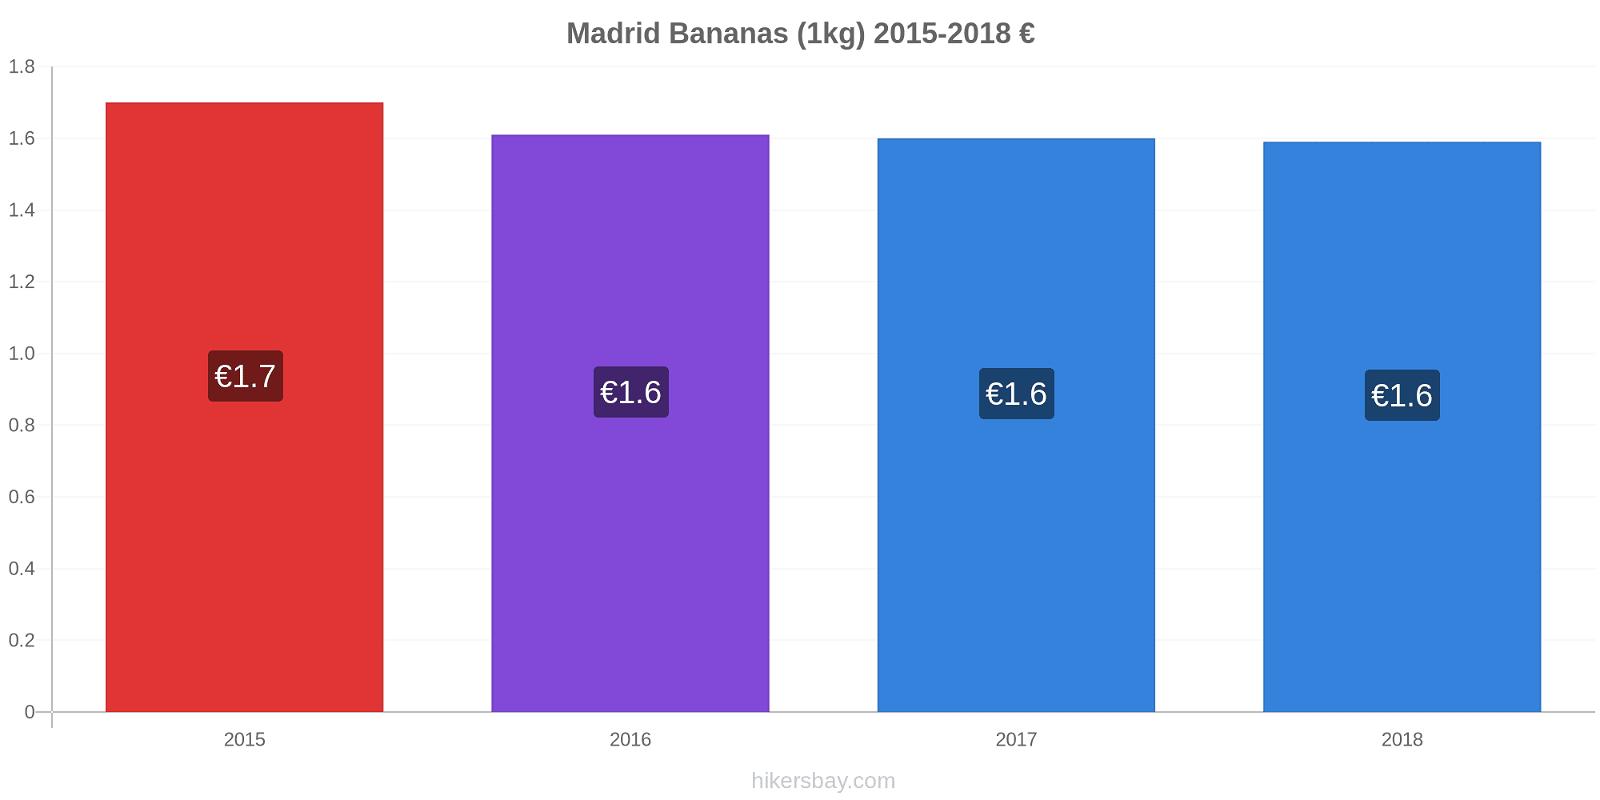 Madrid price changes Bananas (1kg) hikersbay.com